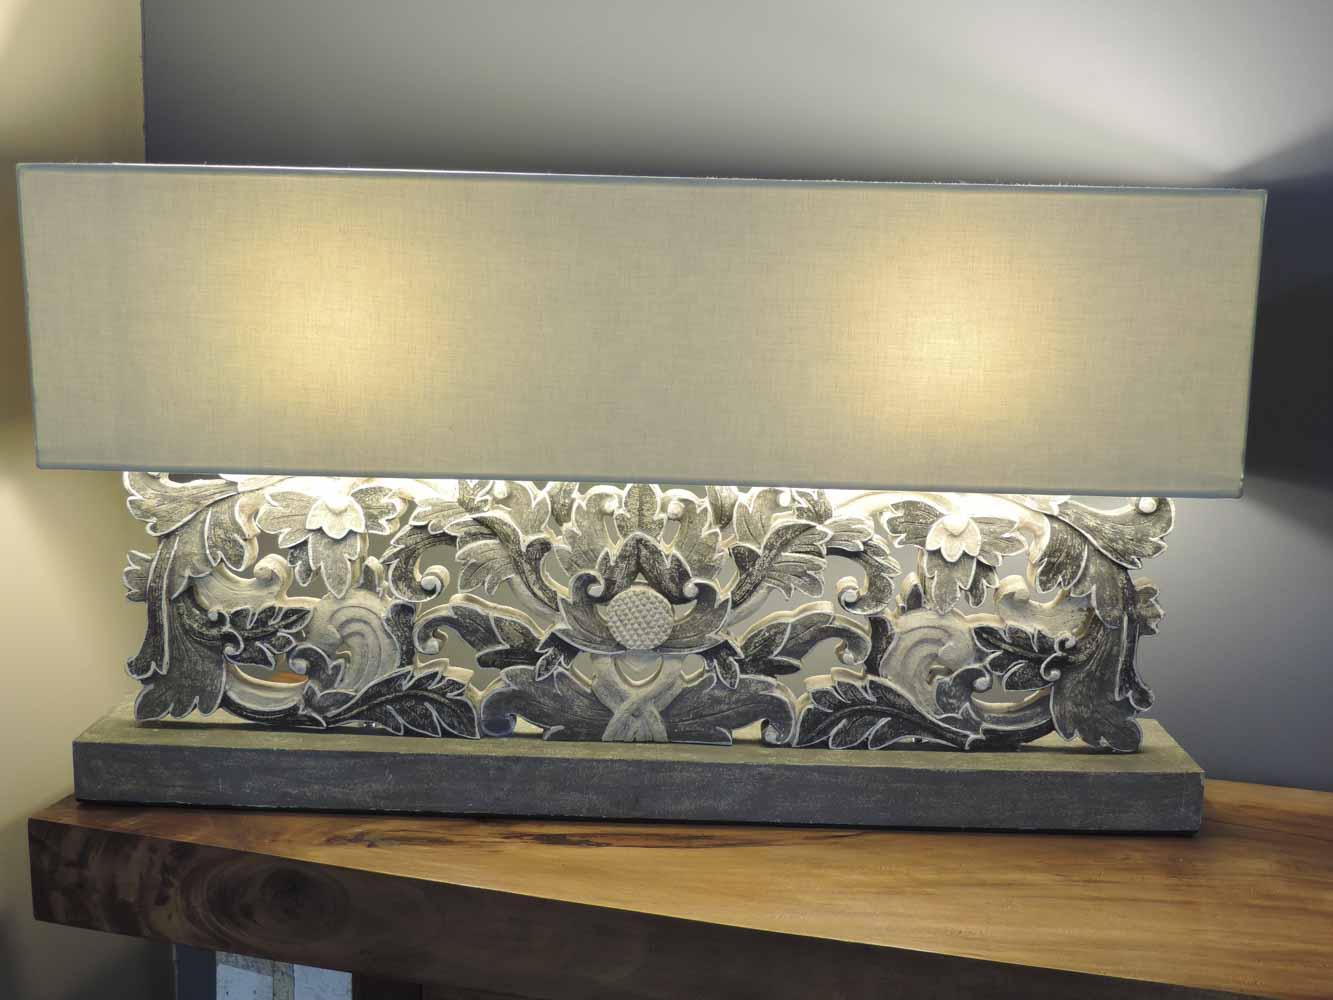 lampe poser arabesques et fleurs en bois patin charme. Black Bedroom Furniture Sets. Home Design Ideas